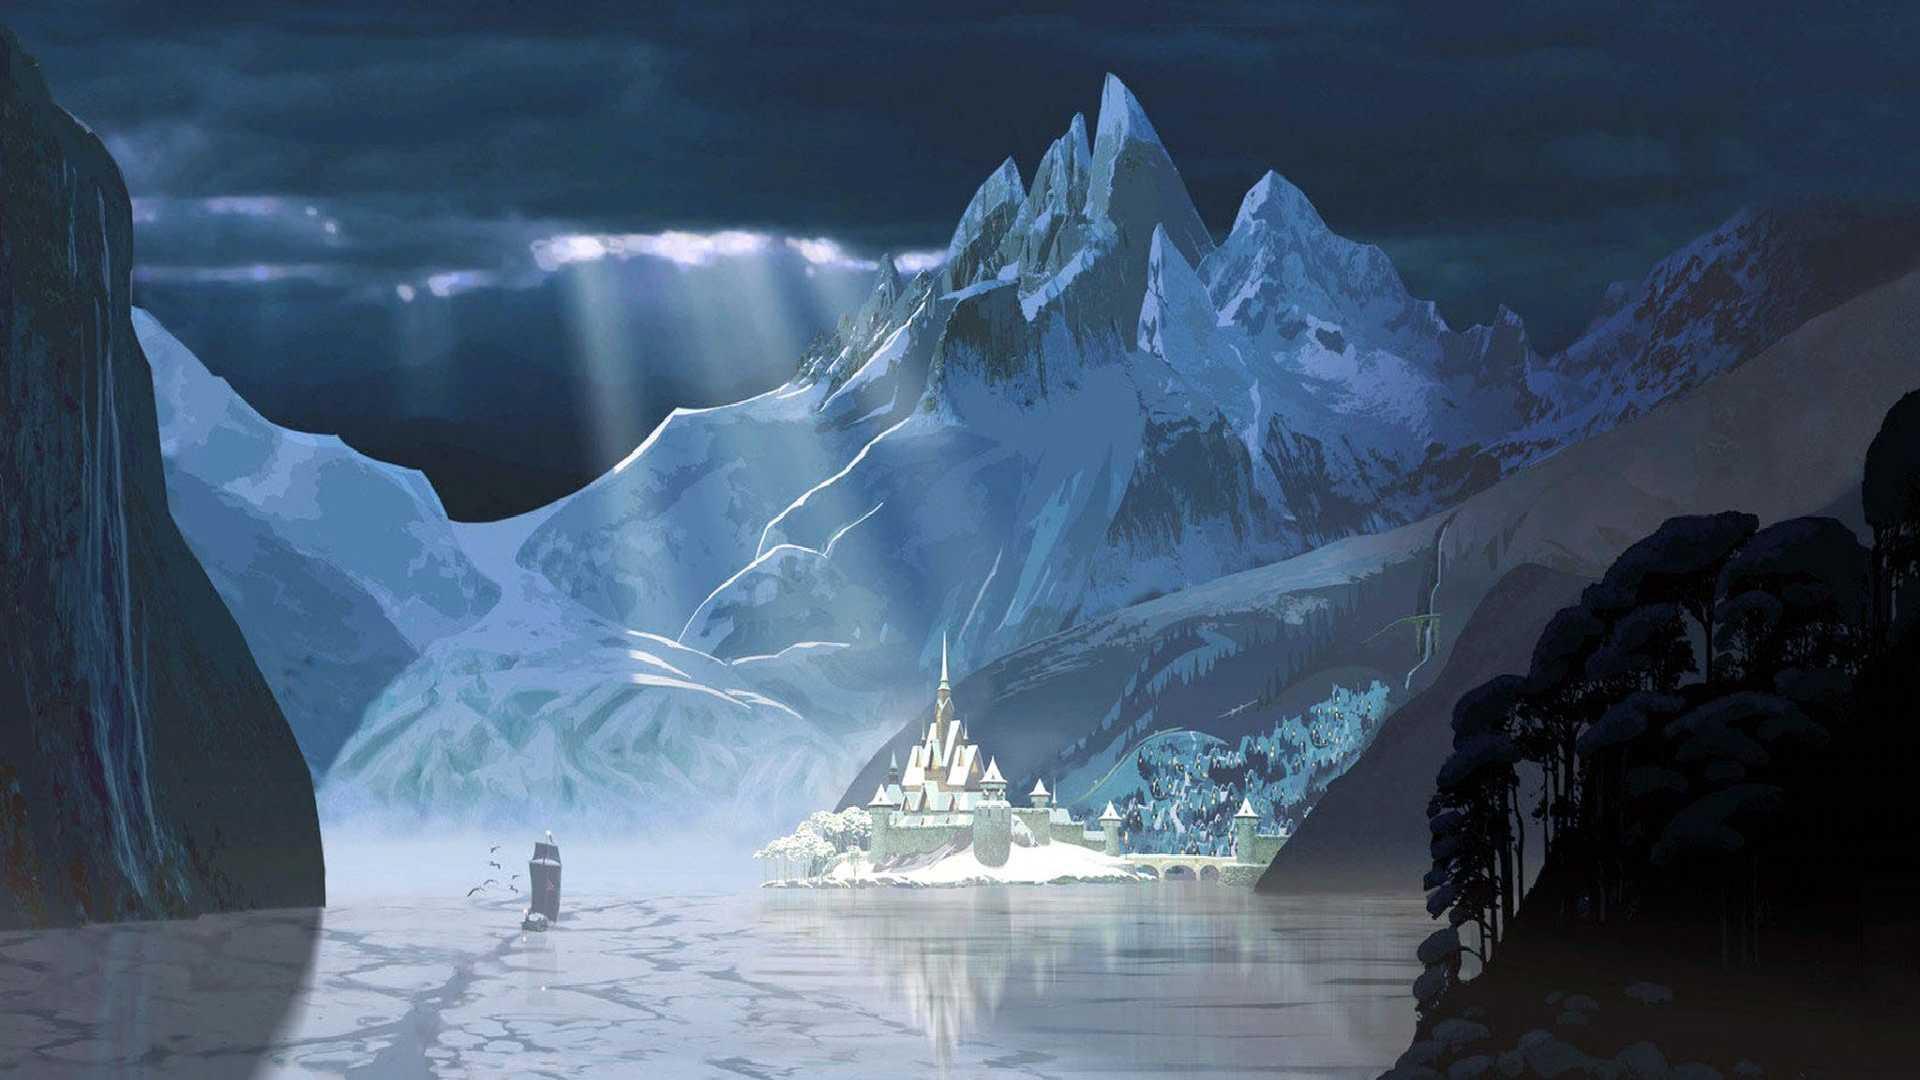 Mobile Wallpapers Hd Animated Frozen Wallpapers Frozen Disney Fondos Hd